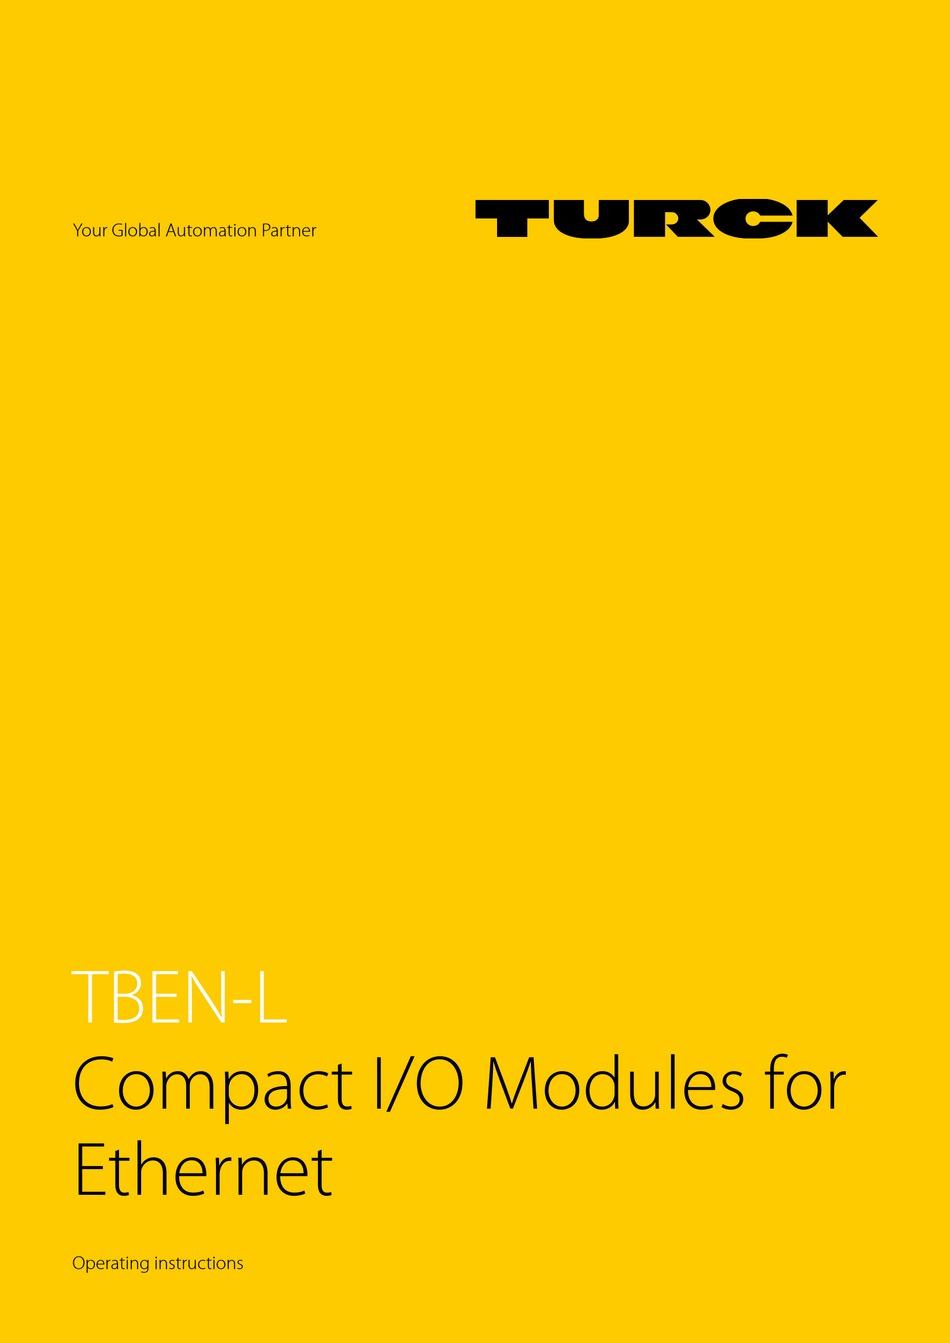 TURCK TBEN-L SERIES OPERATING INSTRUCTIONS MANUAL Pdf Download | ManualsLib | Turck I O Block Wiring Diagram |  | ManualsLib